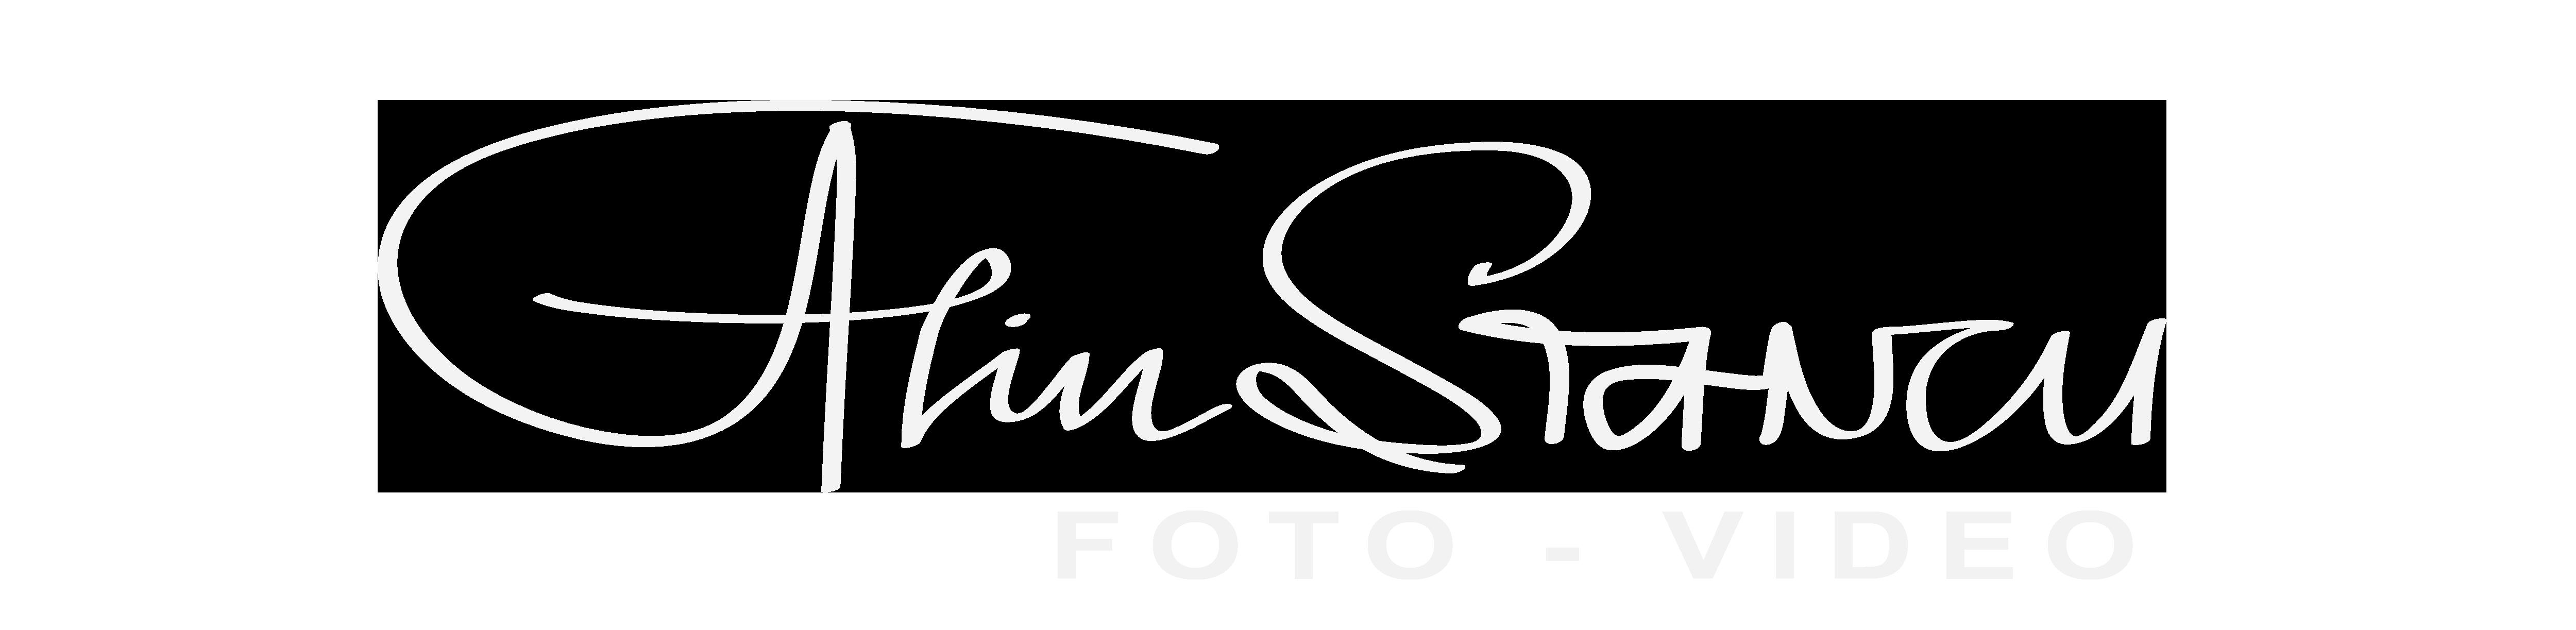 Fotonunta.net - fotografie nunta, videografie nunta, evenimente, botez